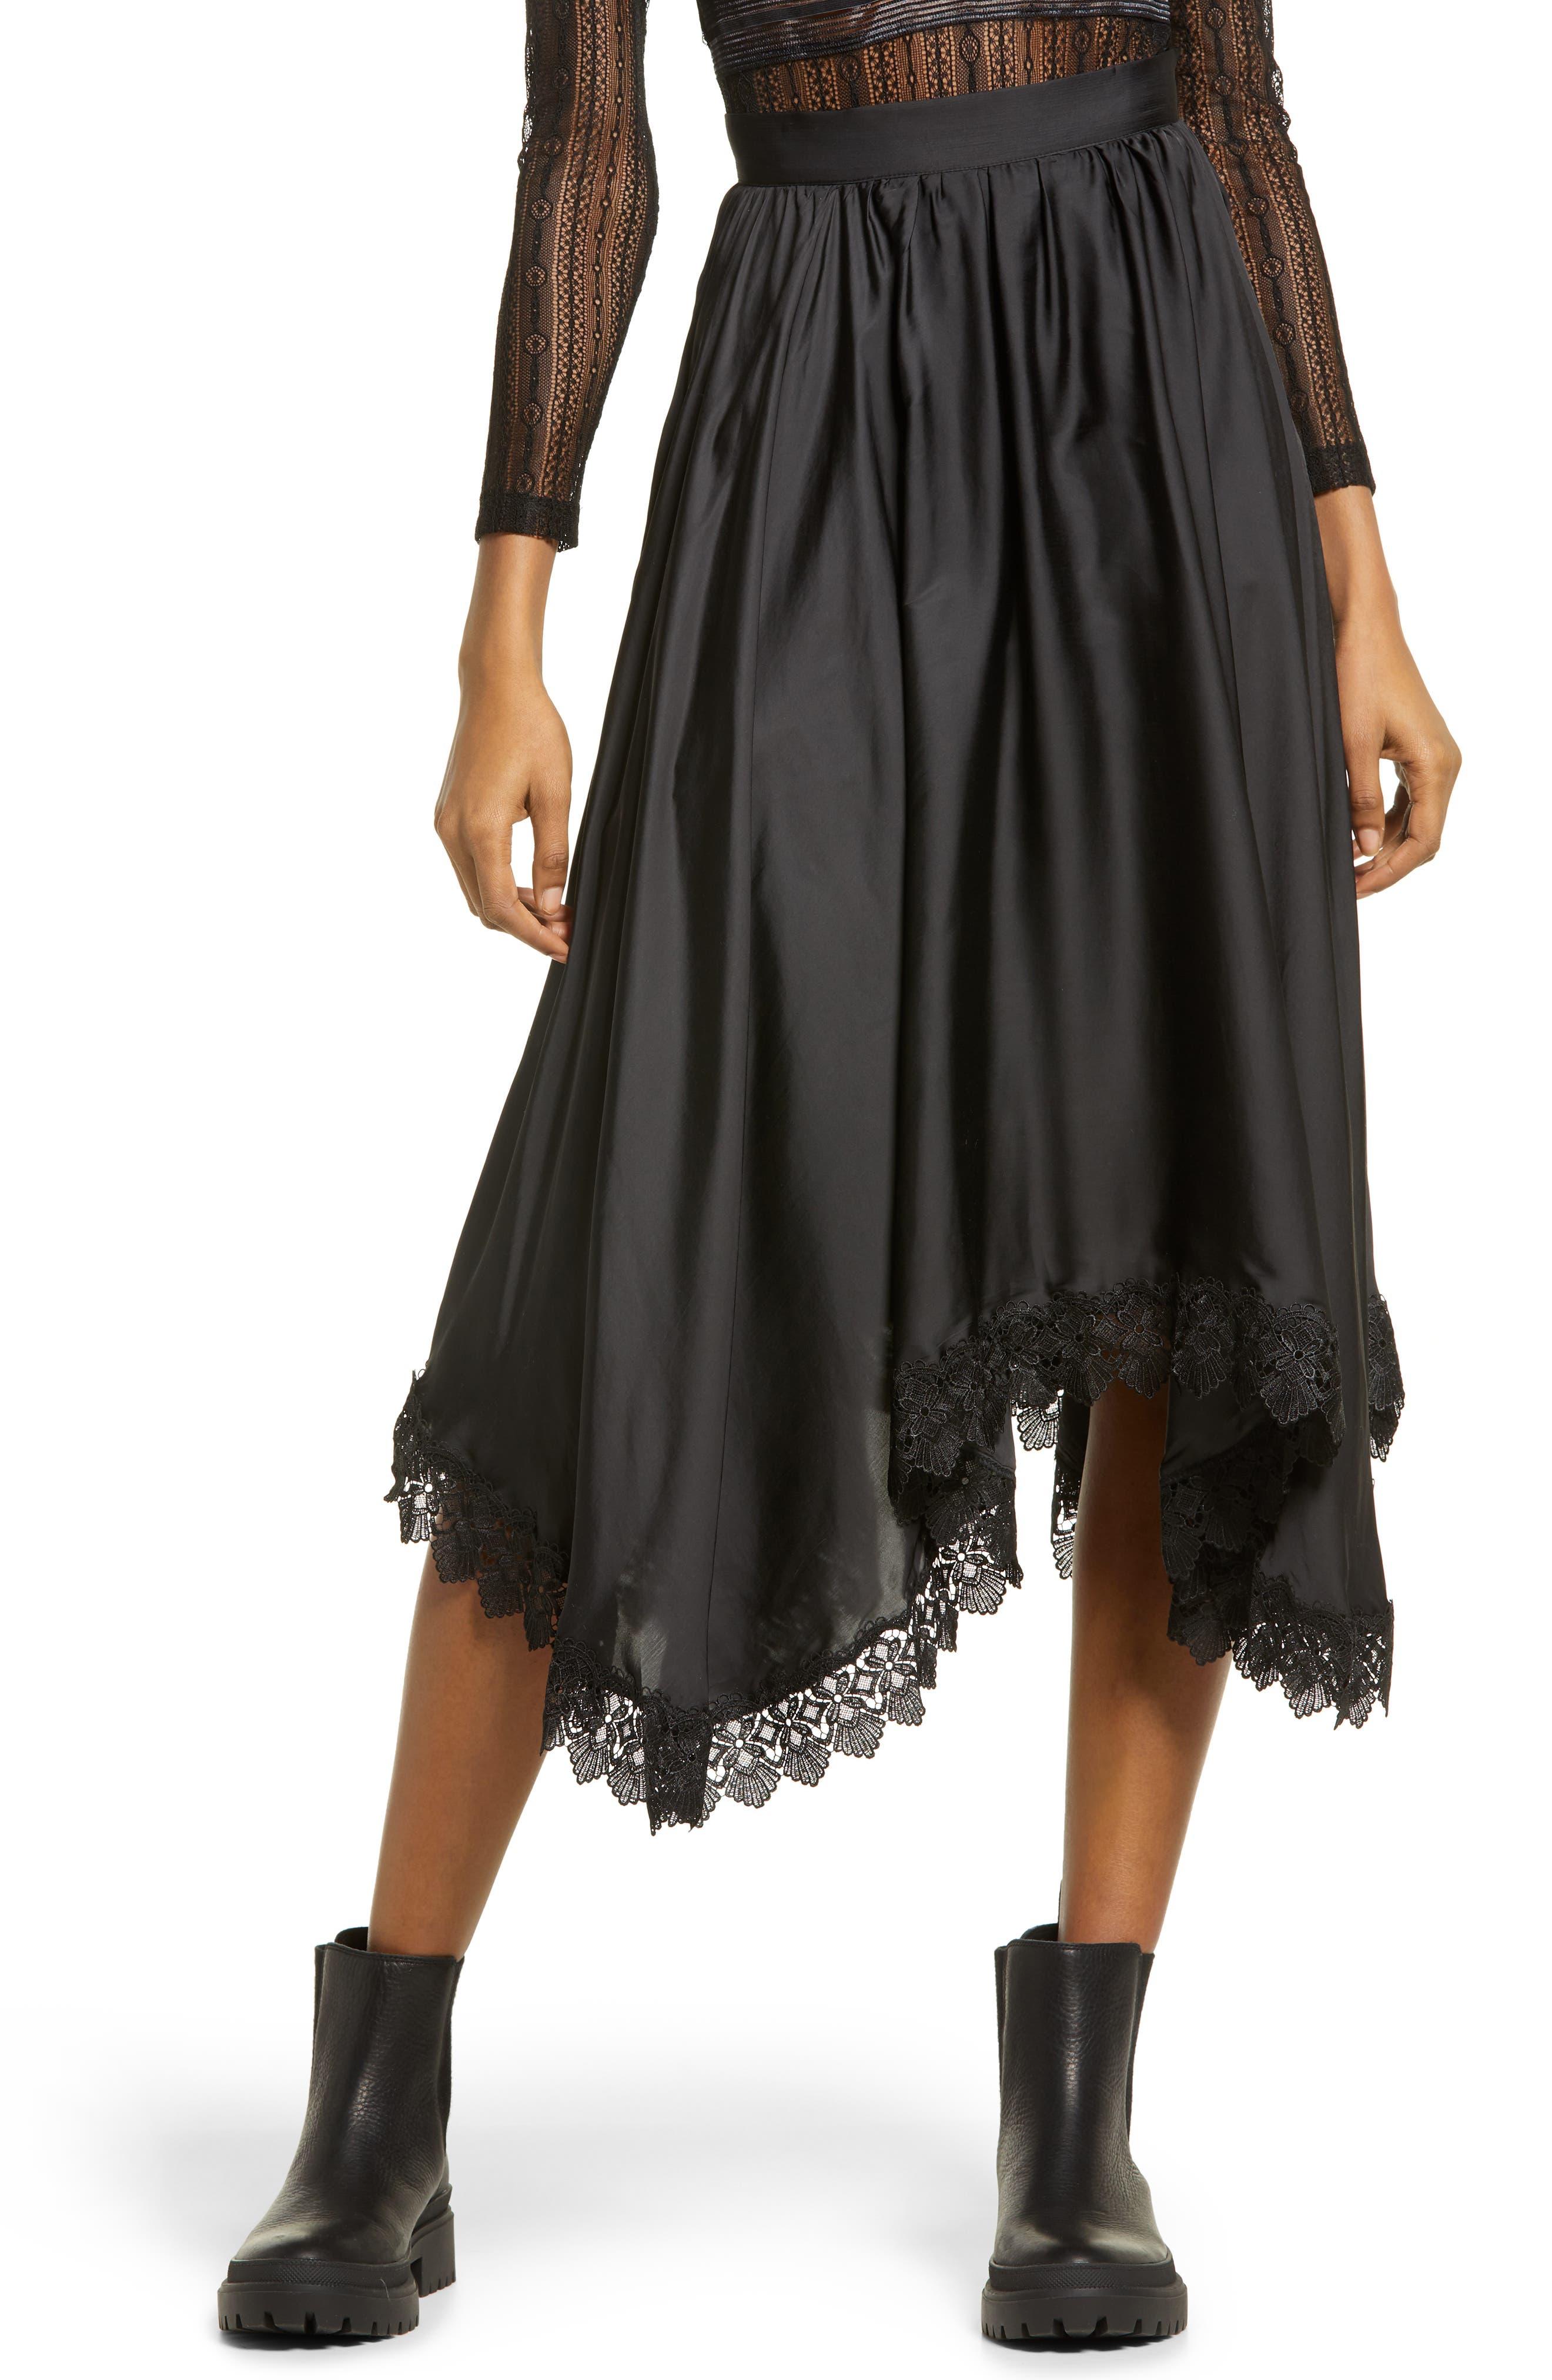 Dorset Lace Hem Skirt